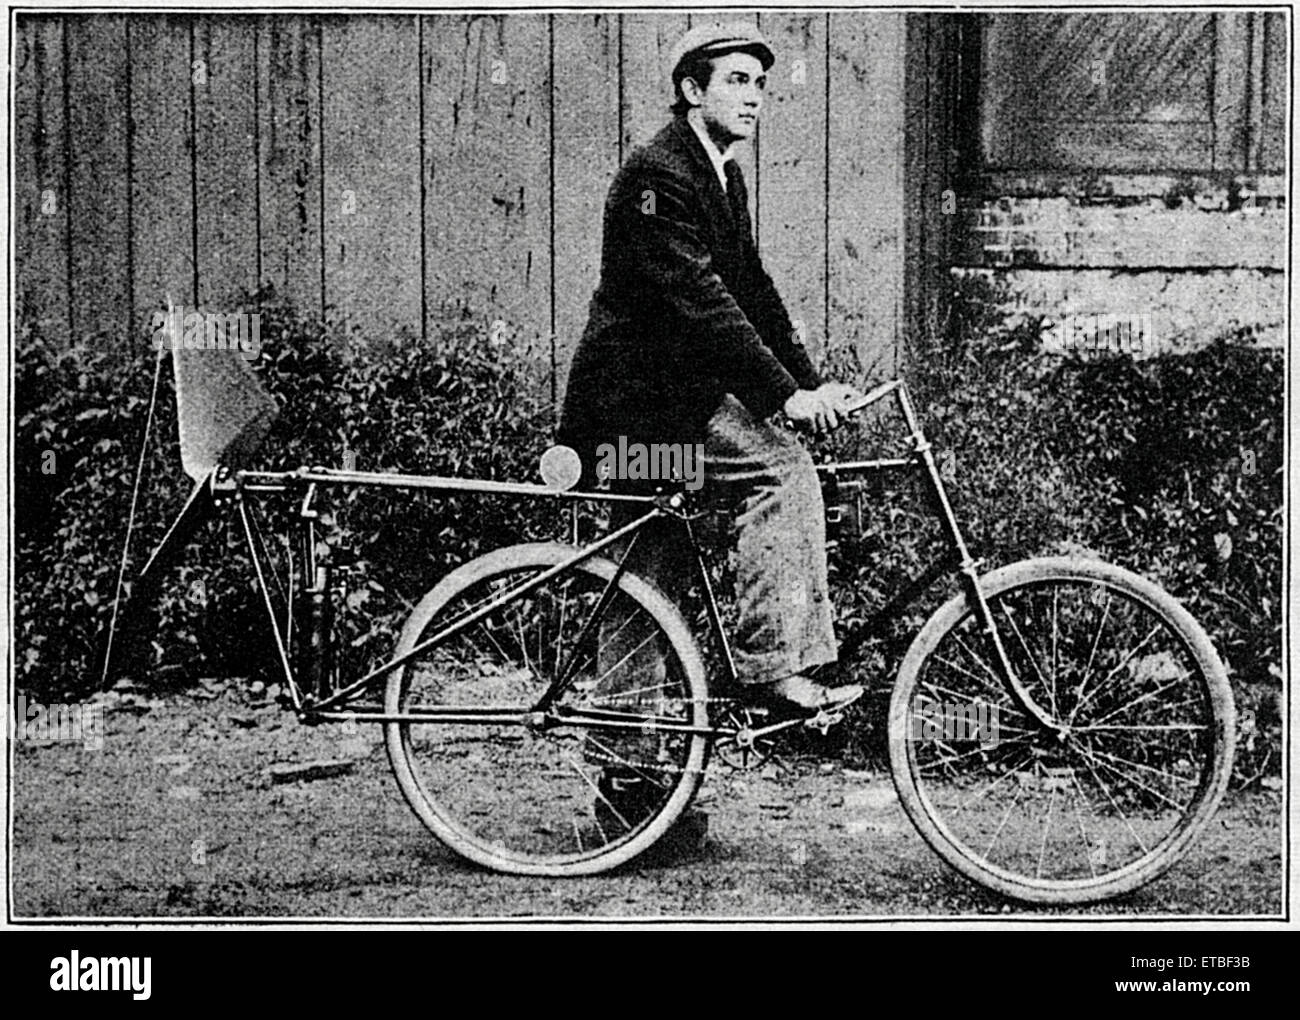 Man on Fan-Motor Bicycle, Racine, Wisconsin, USA, circa 1896 - Stock Image